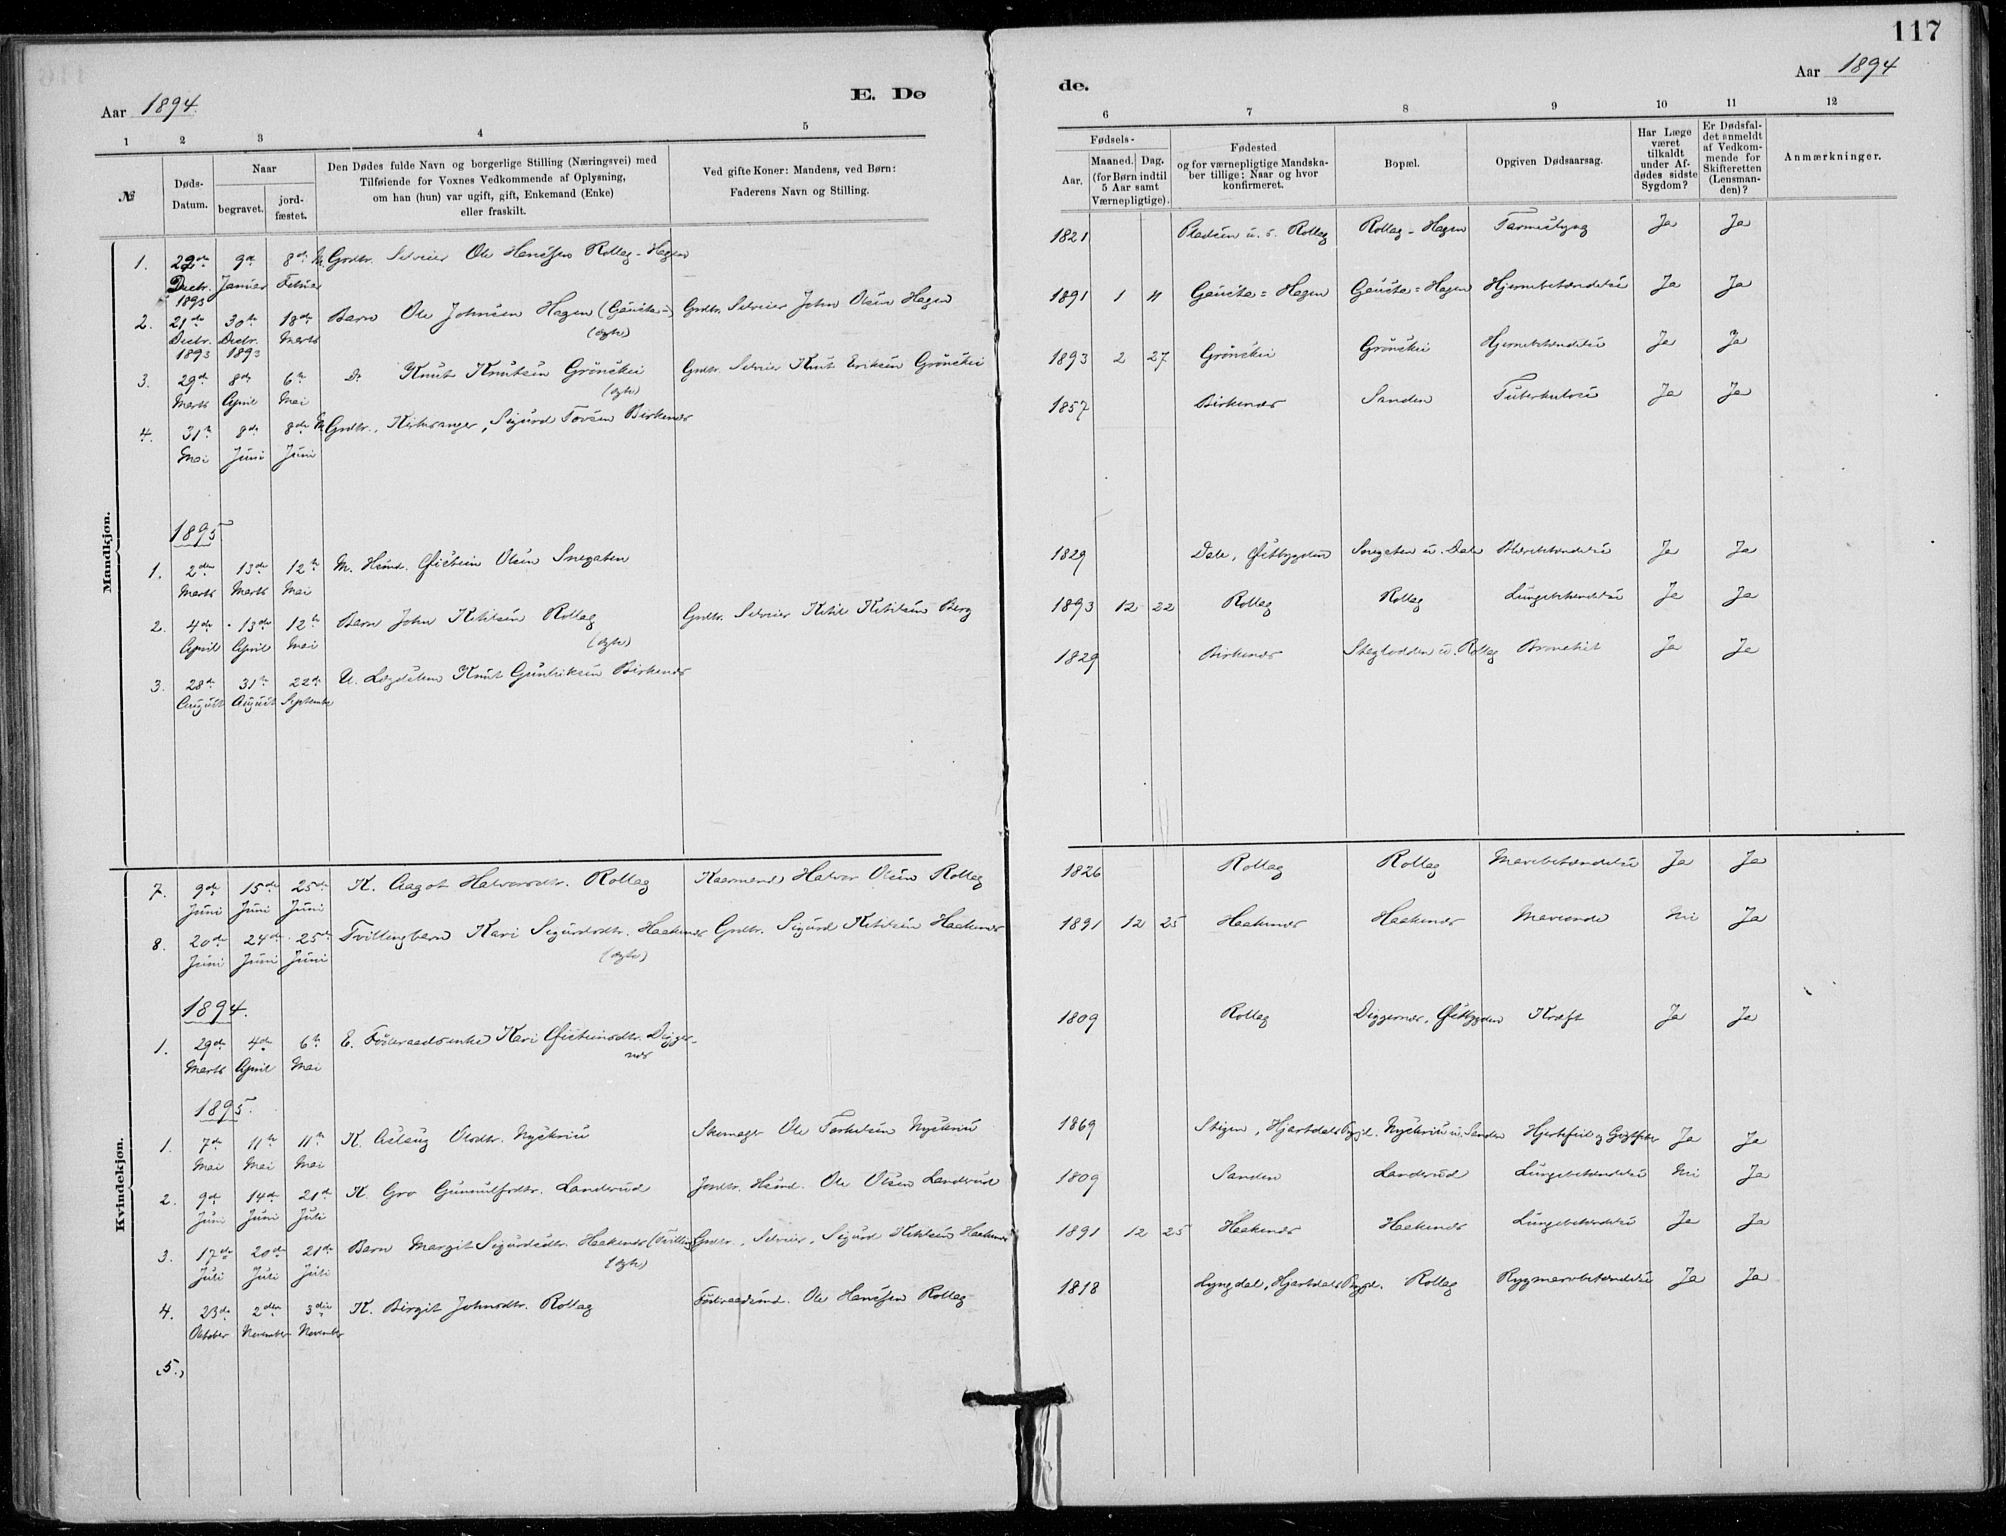 SAKO, Tinn kirkebøker, F/Fb/L0002: Ministerialbok nr. II 2, 1878-1917, s. 117